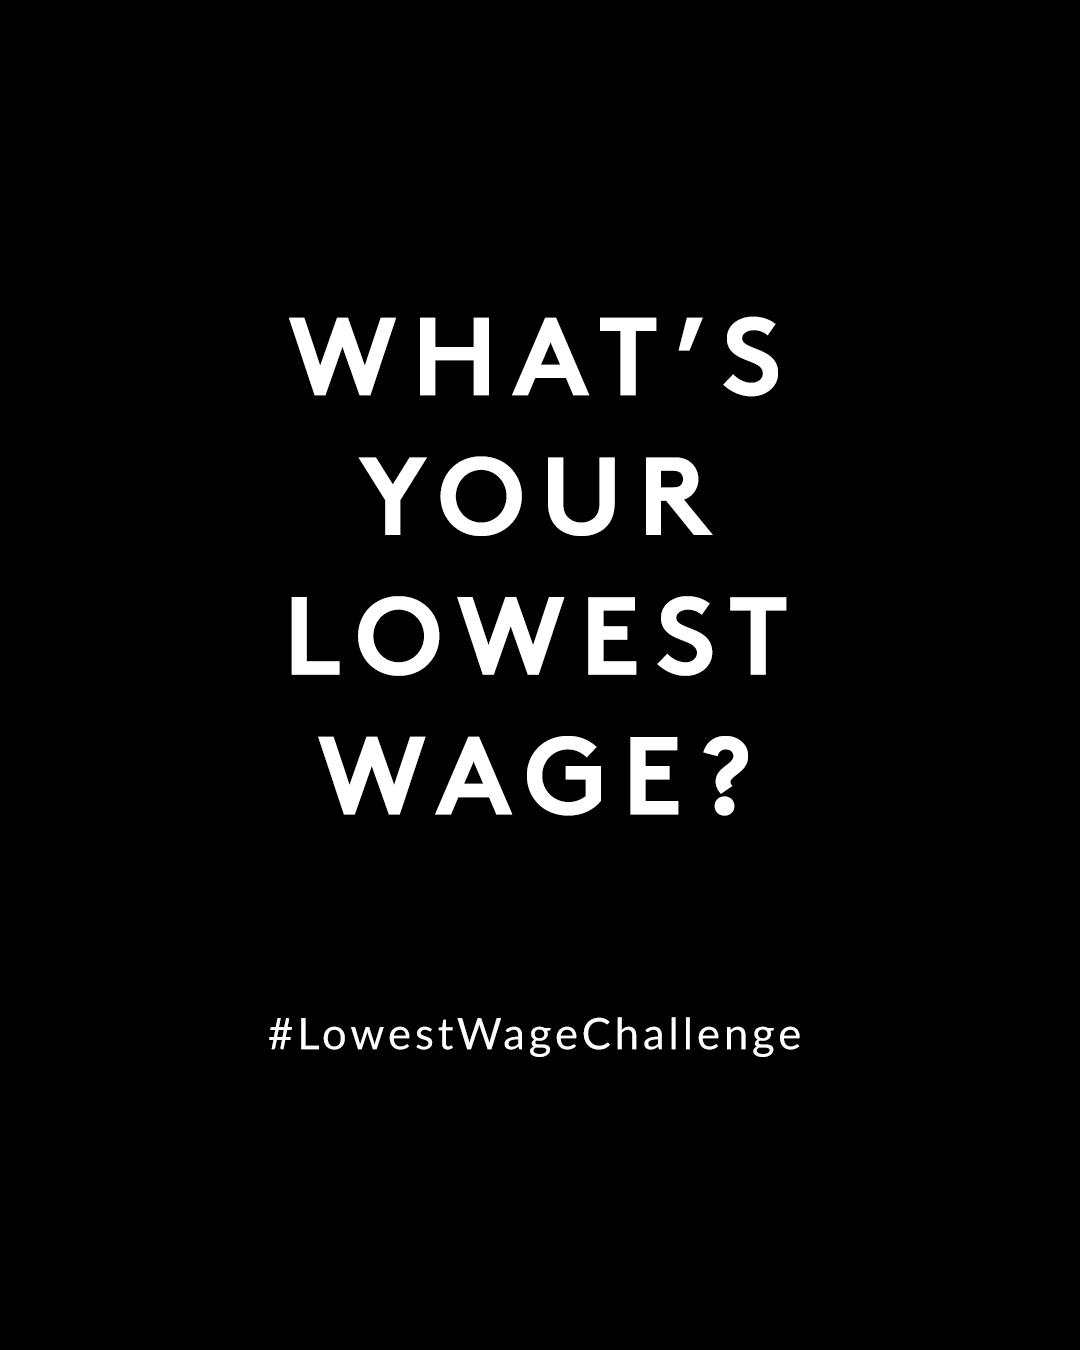 SNSで衣服労働者の環境改善へ「#LowestWageChallenge」